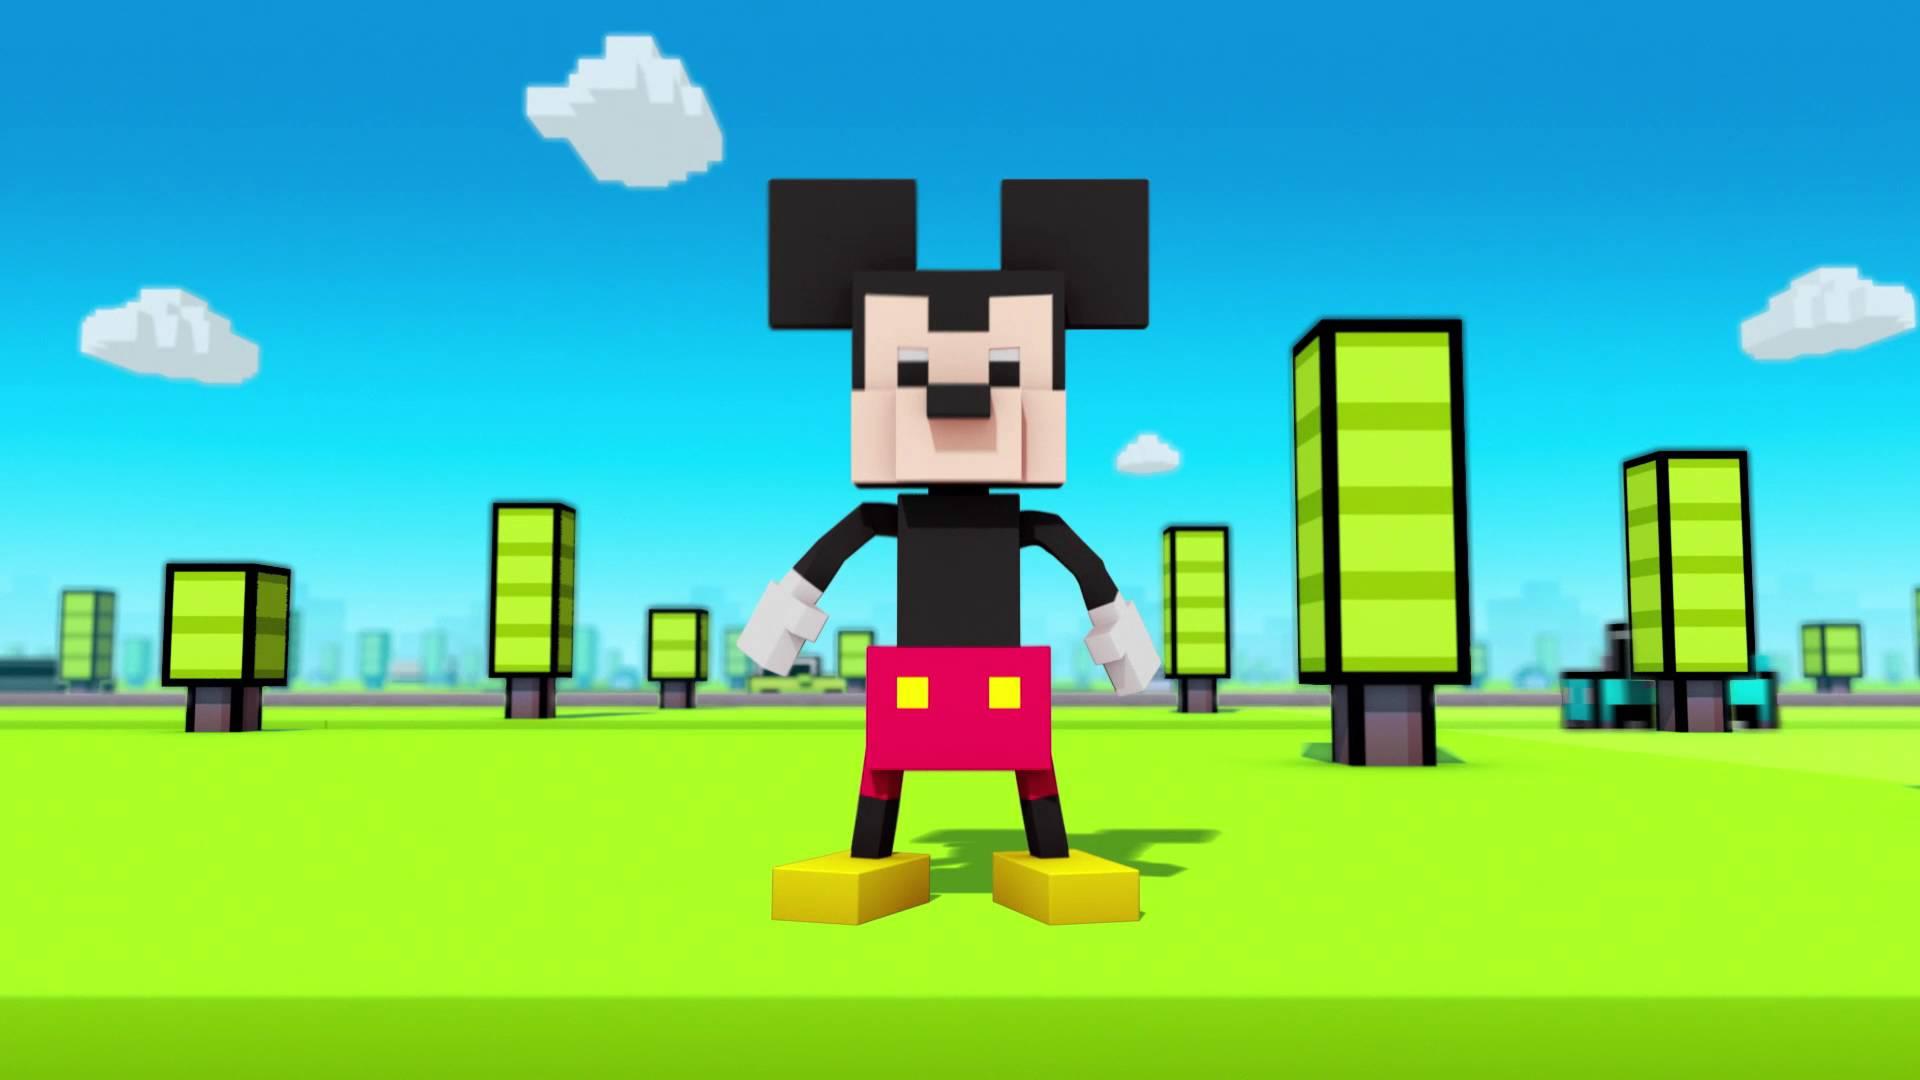 GDC 2016: Disney Crossy Road set to drop on mobile next week